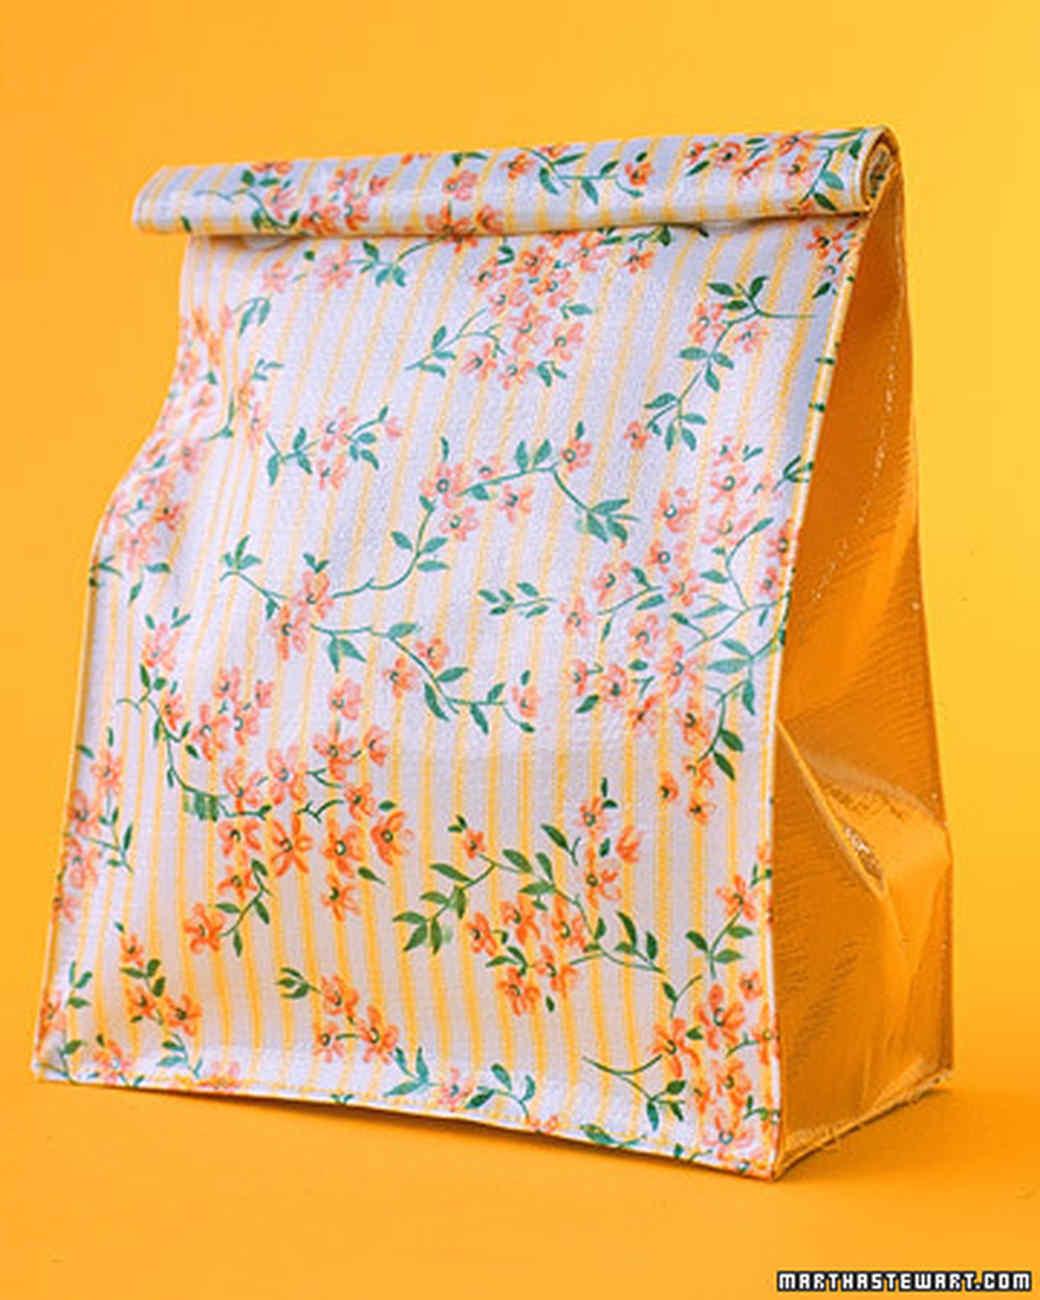 a98535_0701_smallflowerbag.jpg